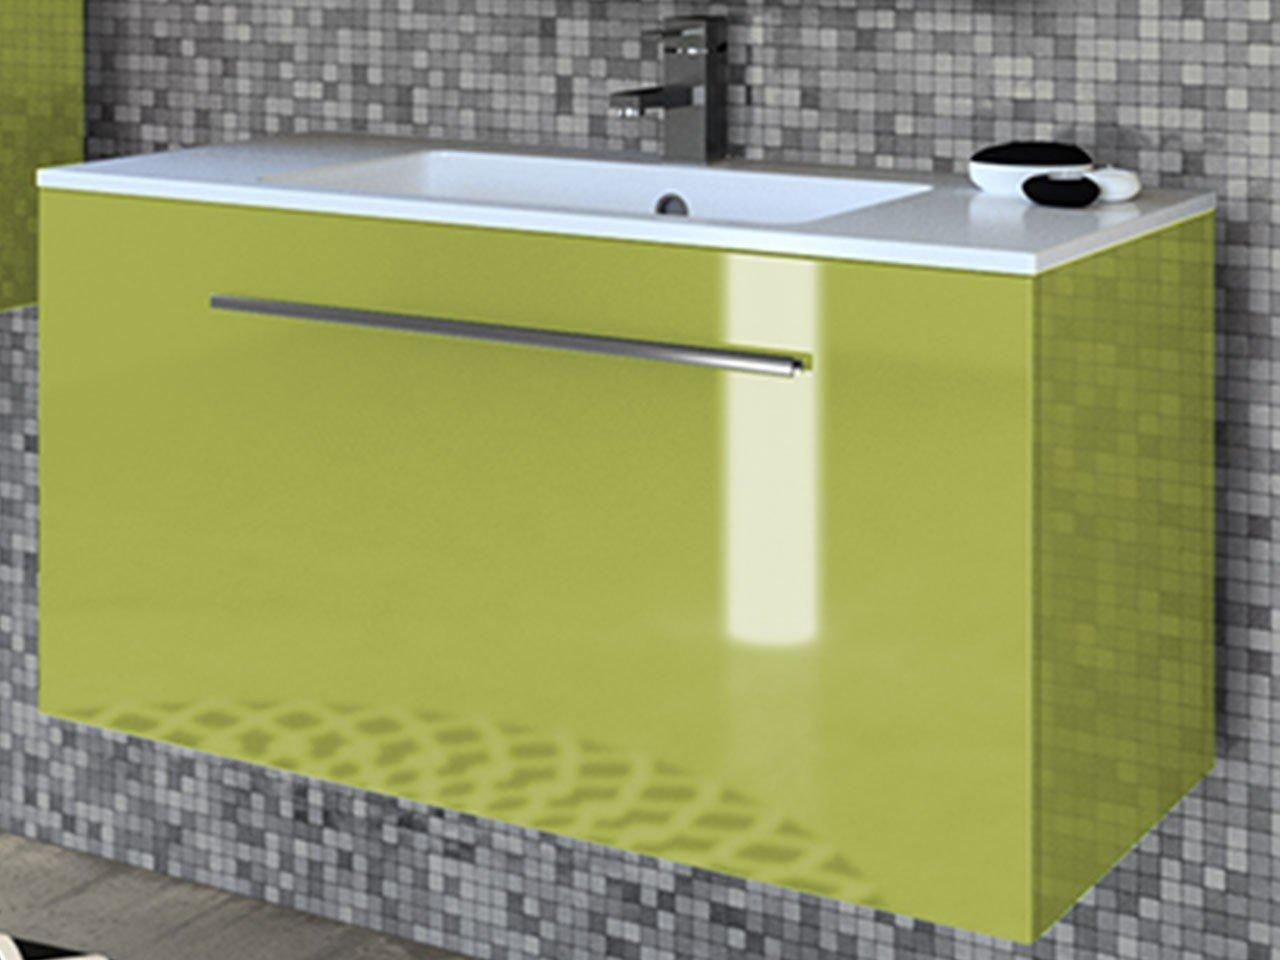 Mobili bagno verdi excellent mobili bagno verdi with mobili bagno verdi good mobile arredo - Tappeti moderni verde acido ...